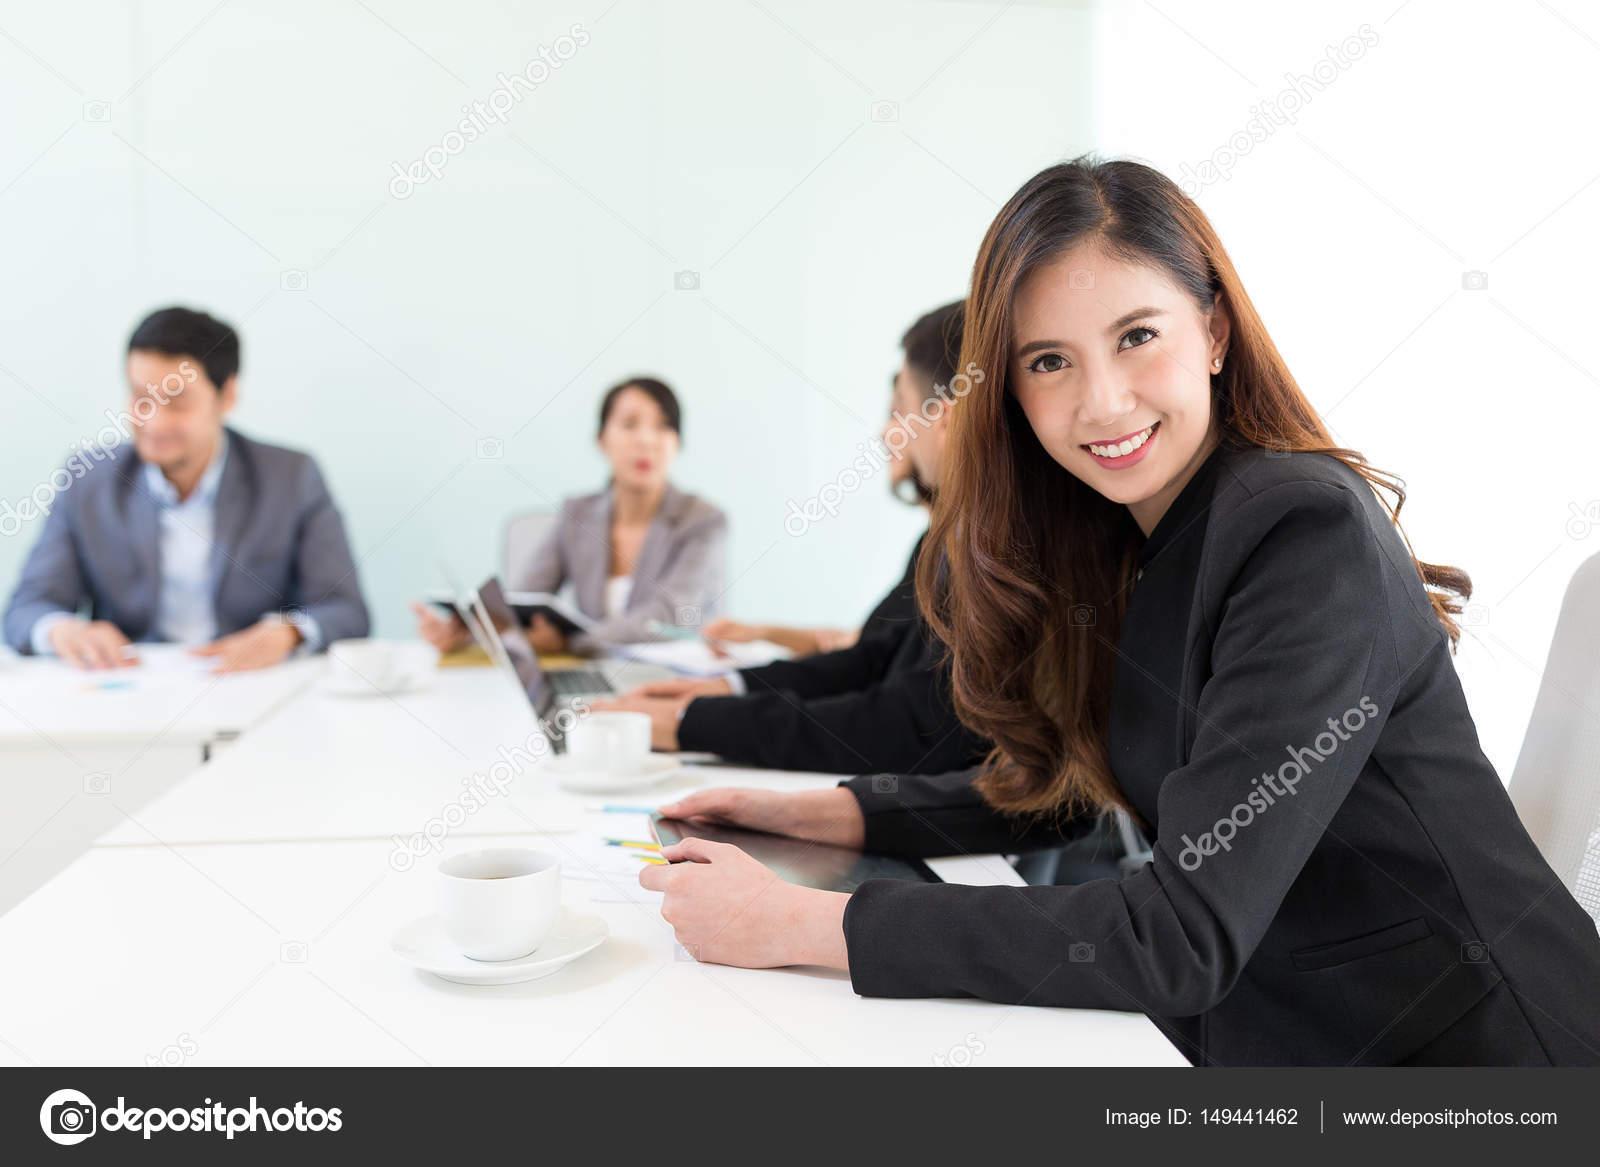 rencontre femmes daffaires